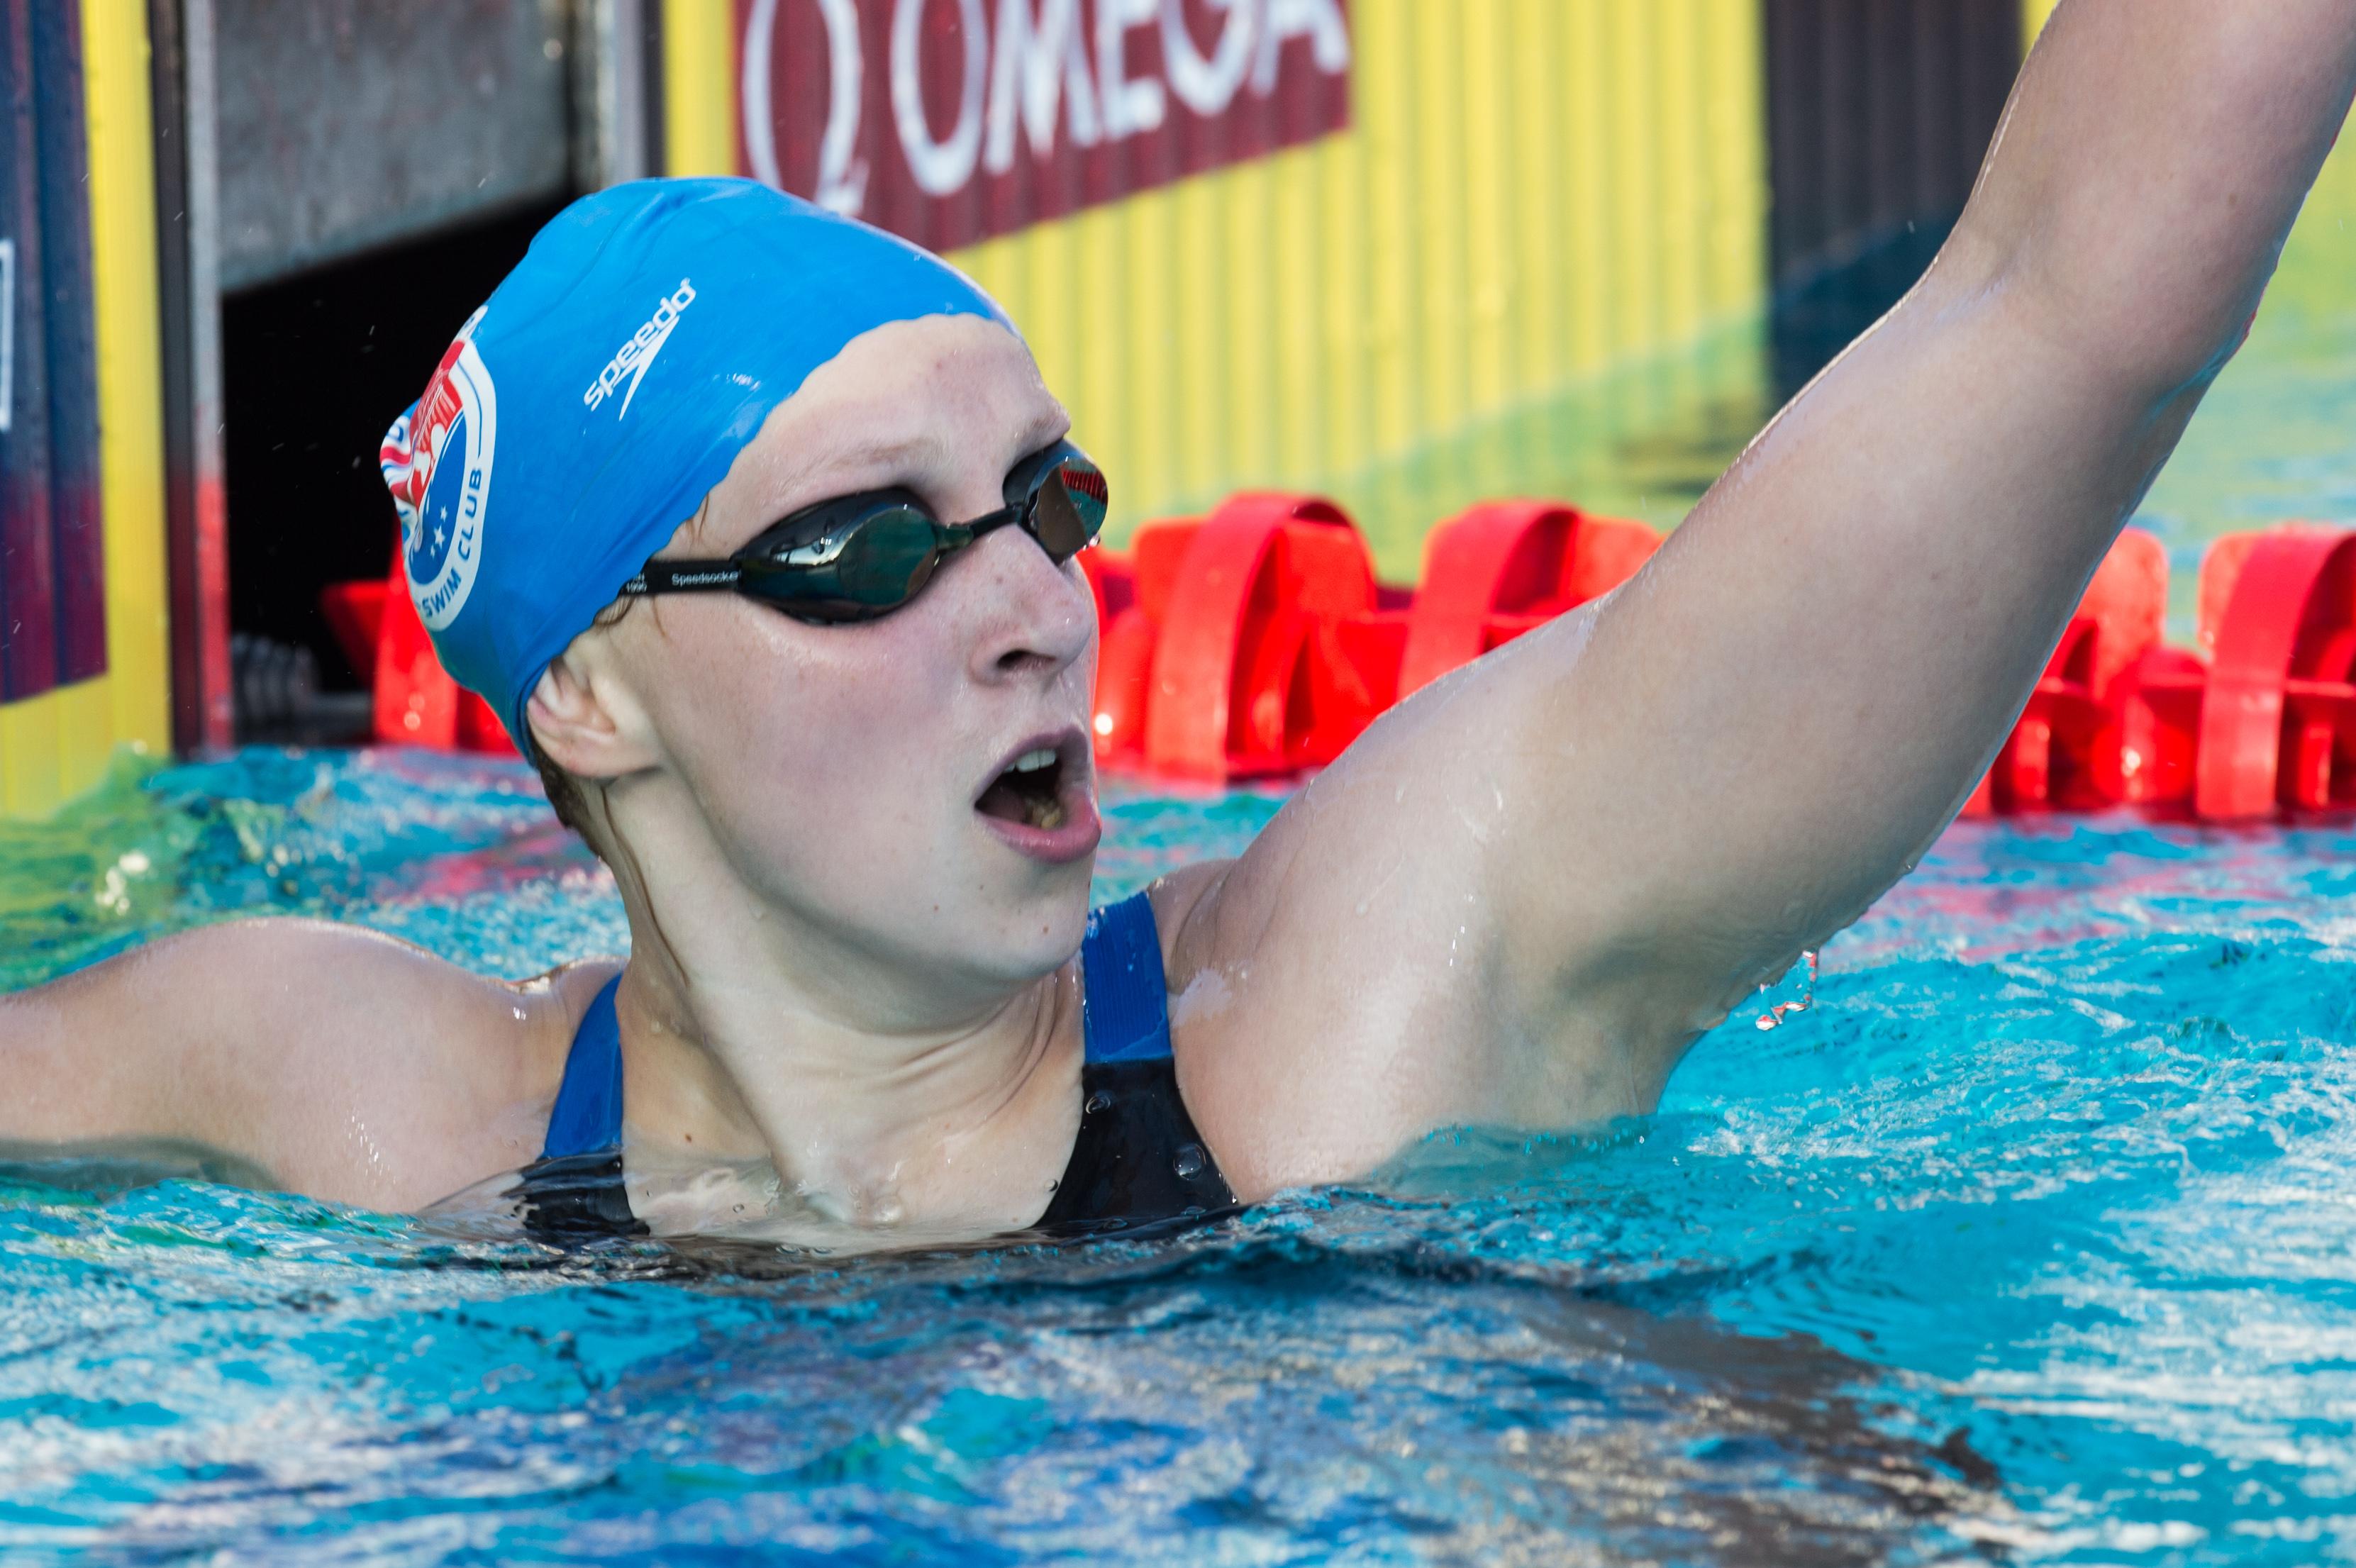 Katie Ledecky: The Best Swimmer in the World - High School